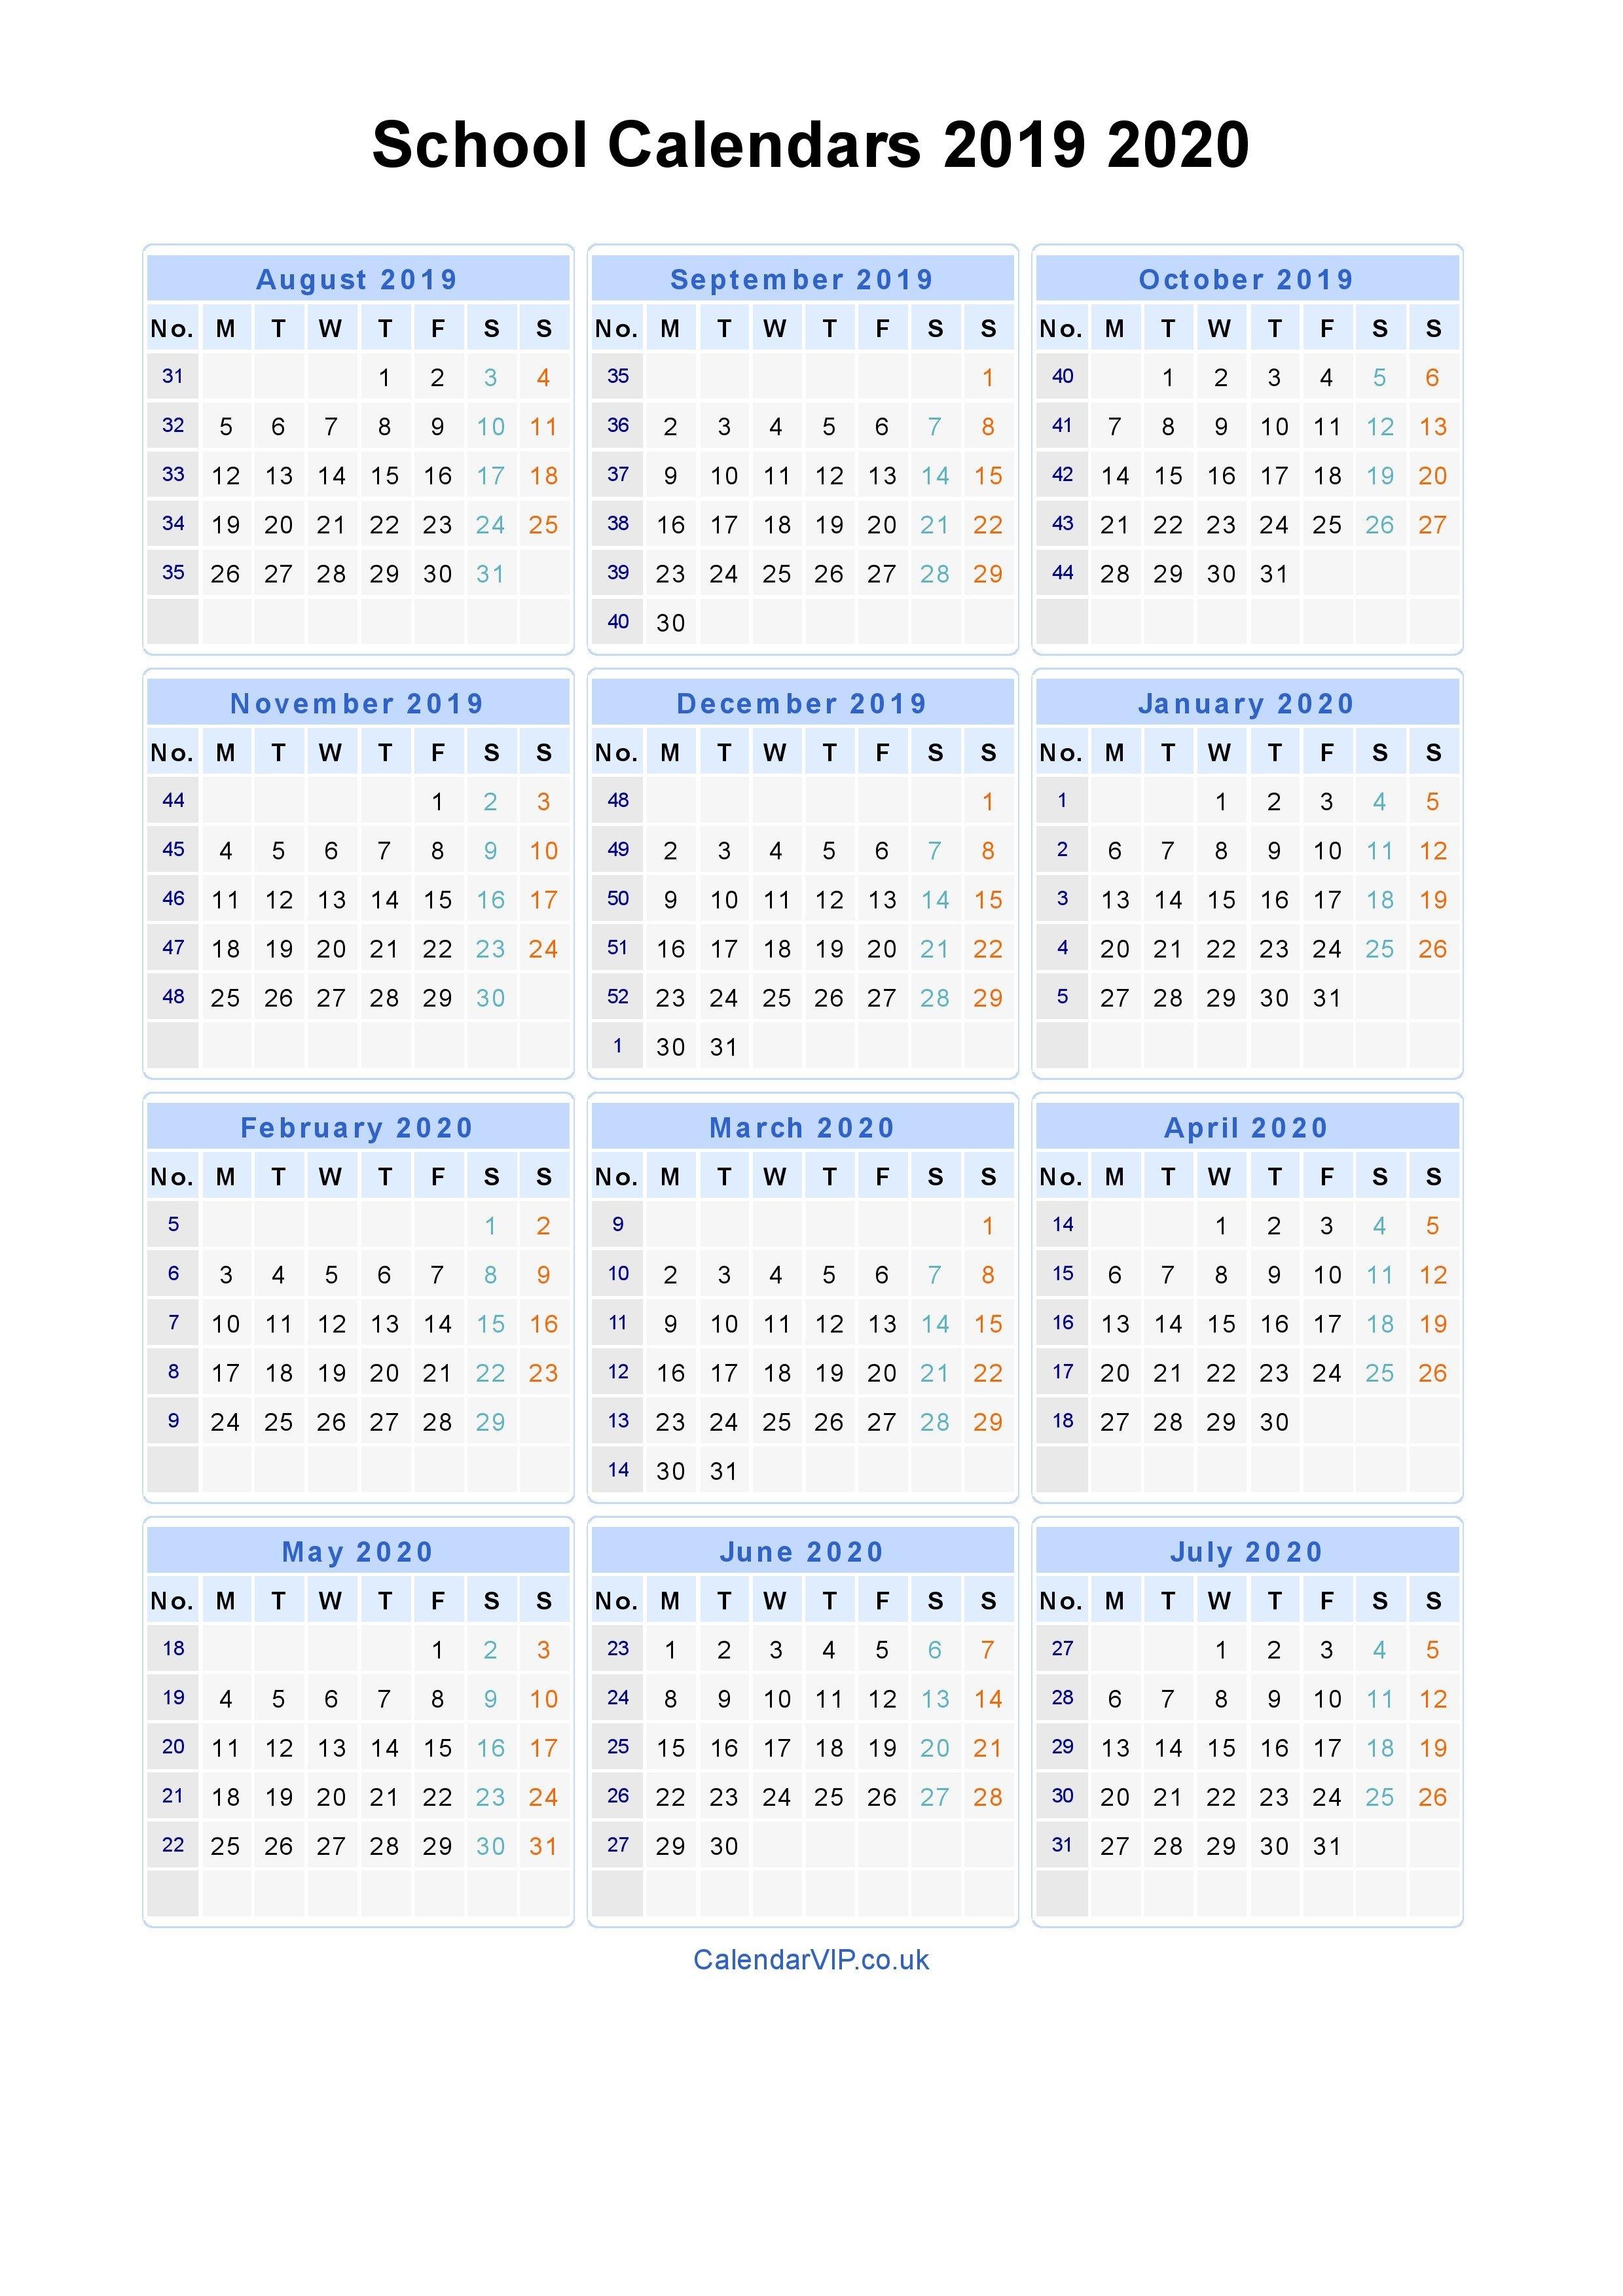 School Calendars 2019 2020 – Calendar From August 2019 To July 2020 Calendar 2019 To 2020